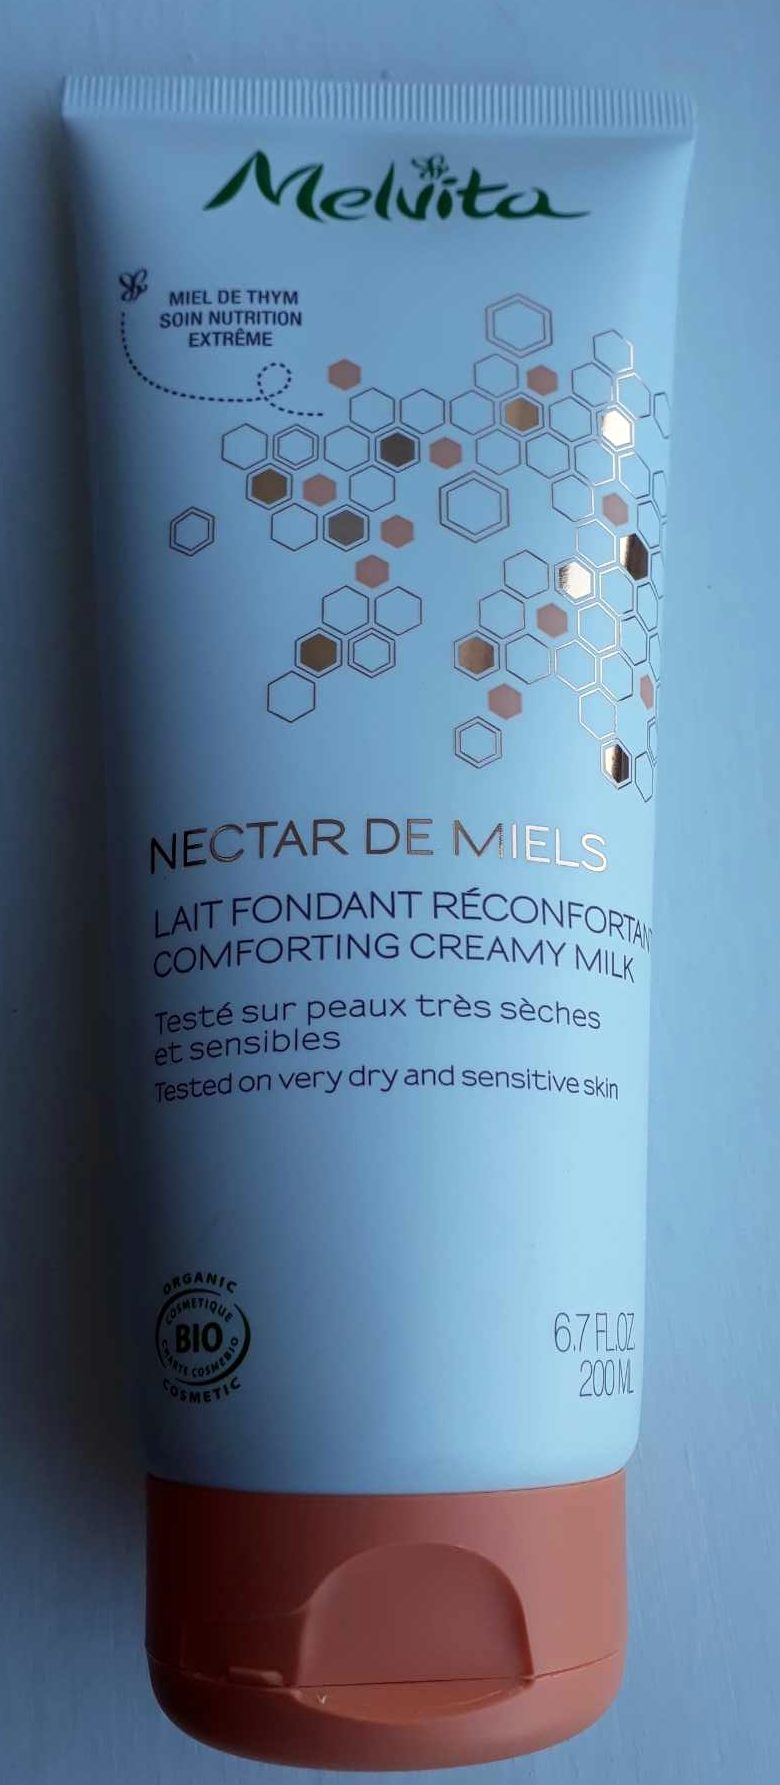 Nectar de miel - Product